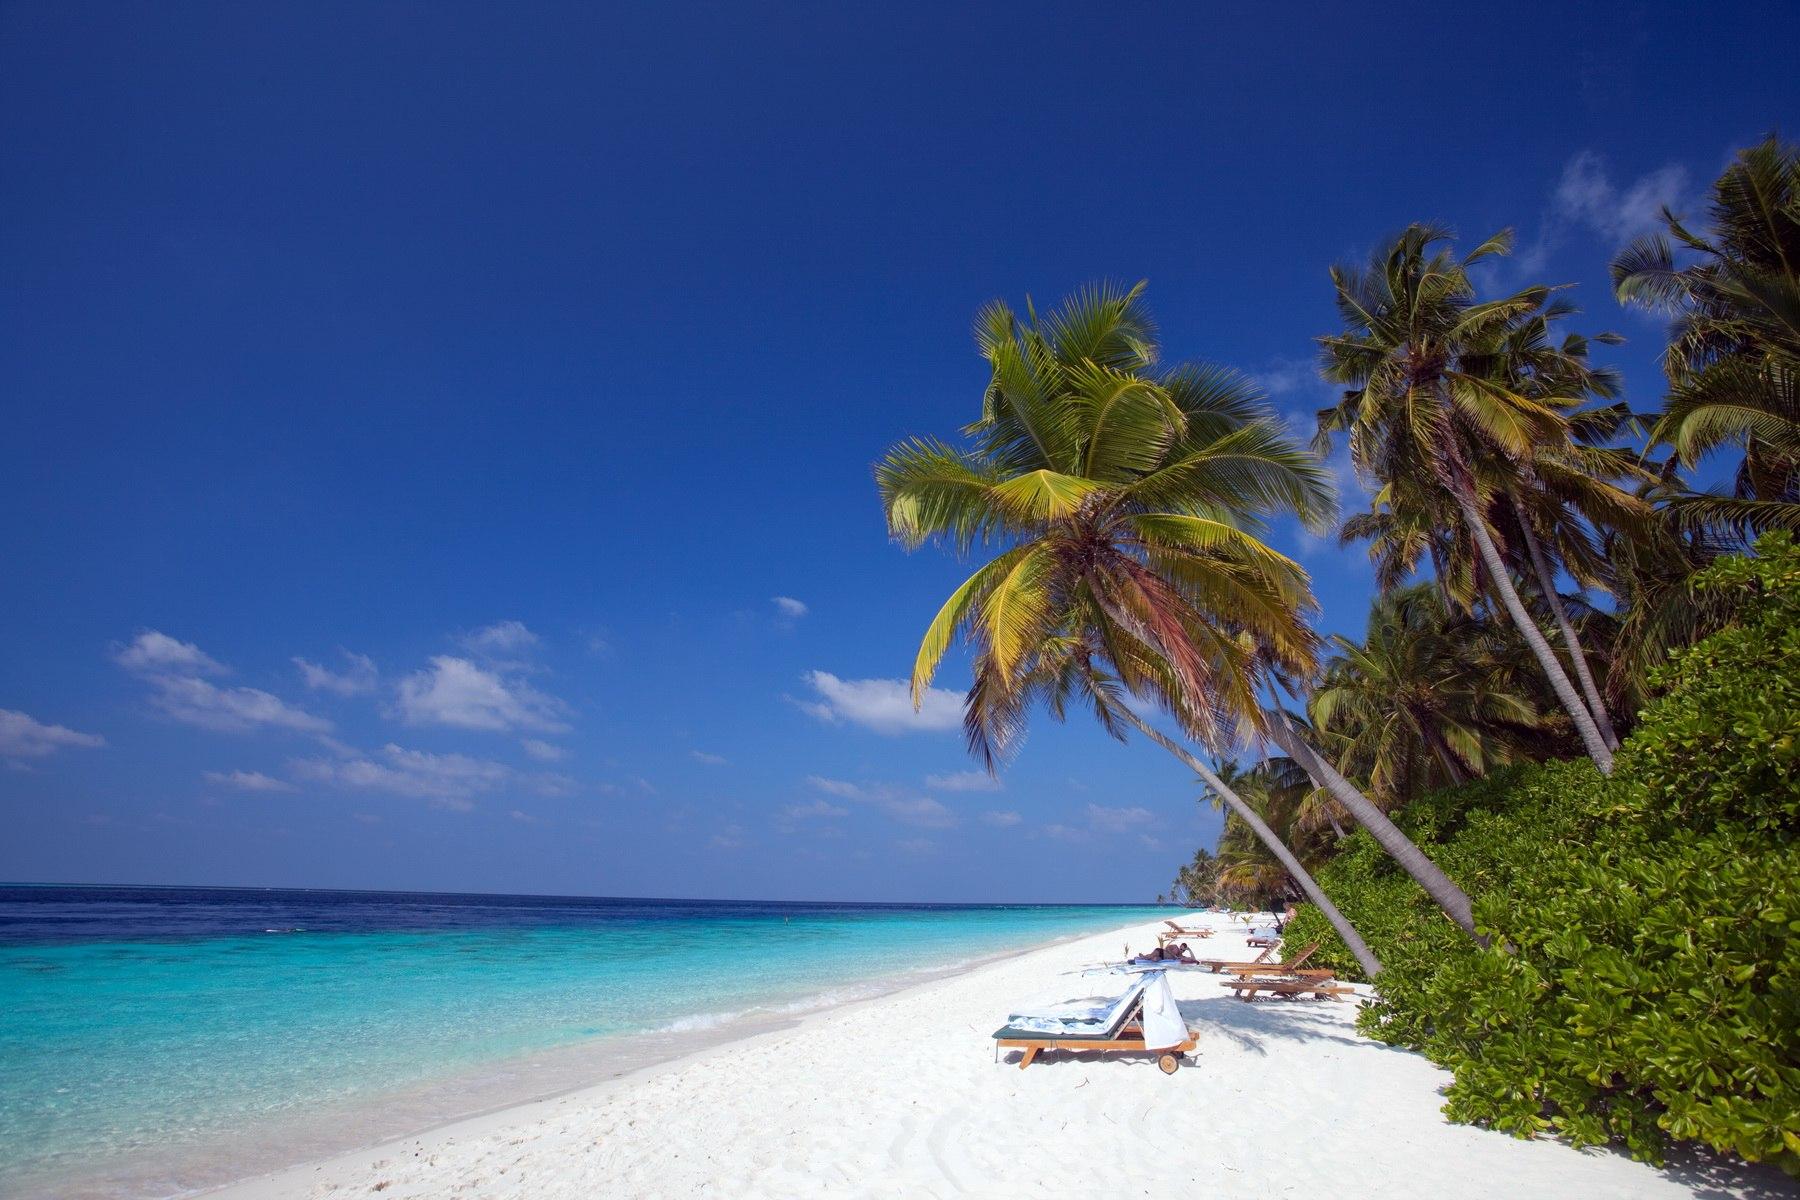 Traumstrand auf Filitheyo Island – Sri Lanka und Malediven